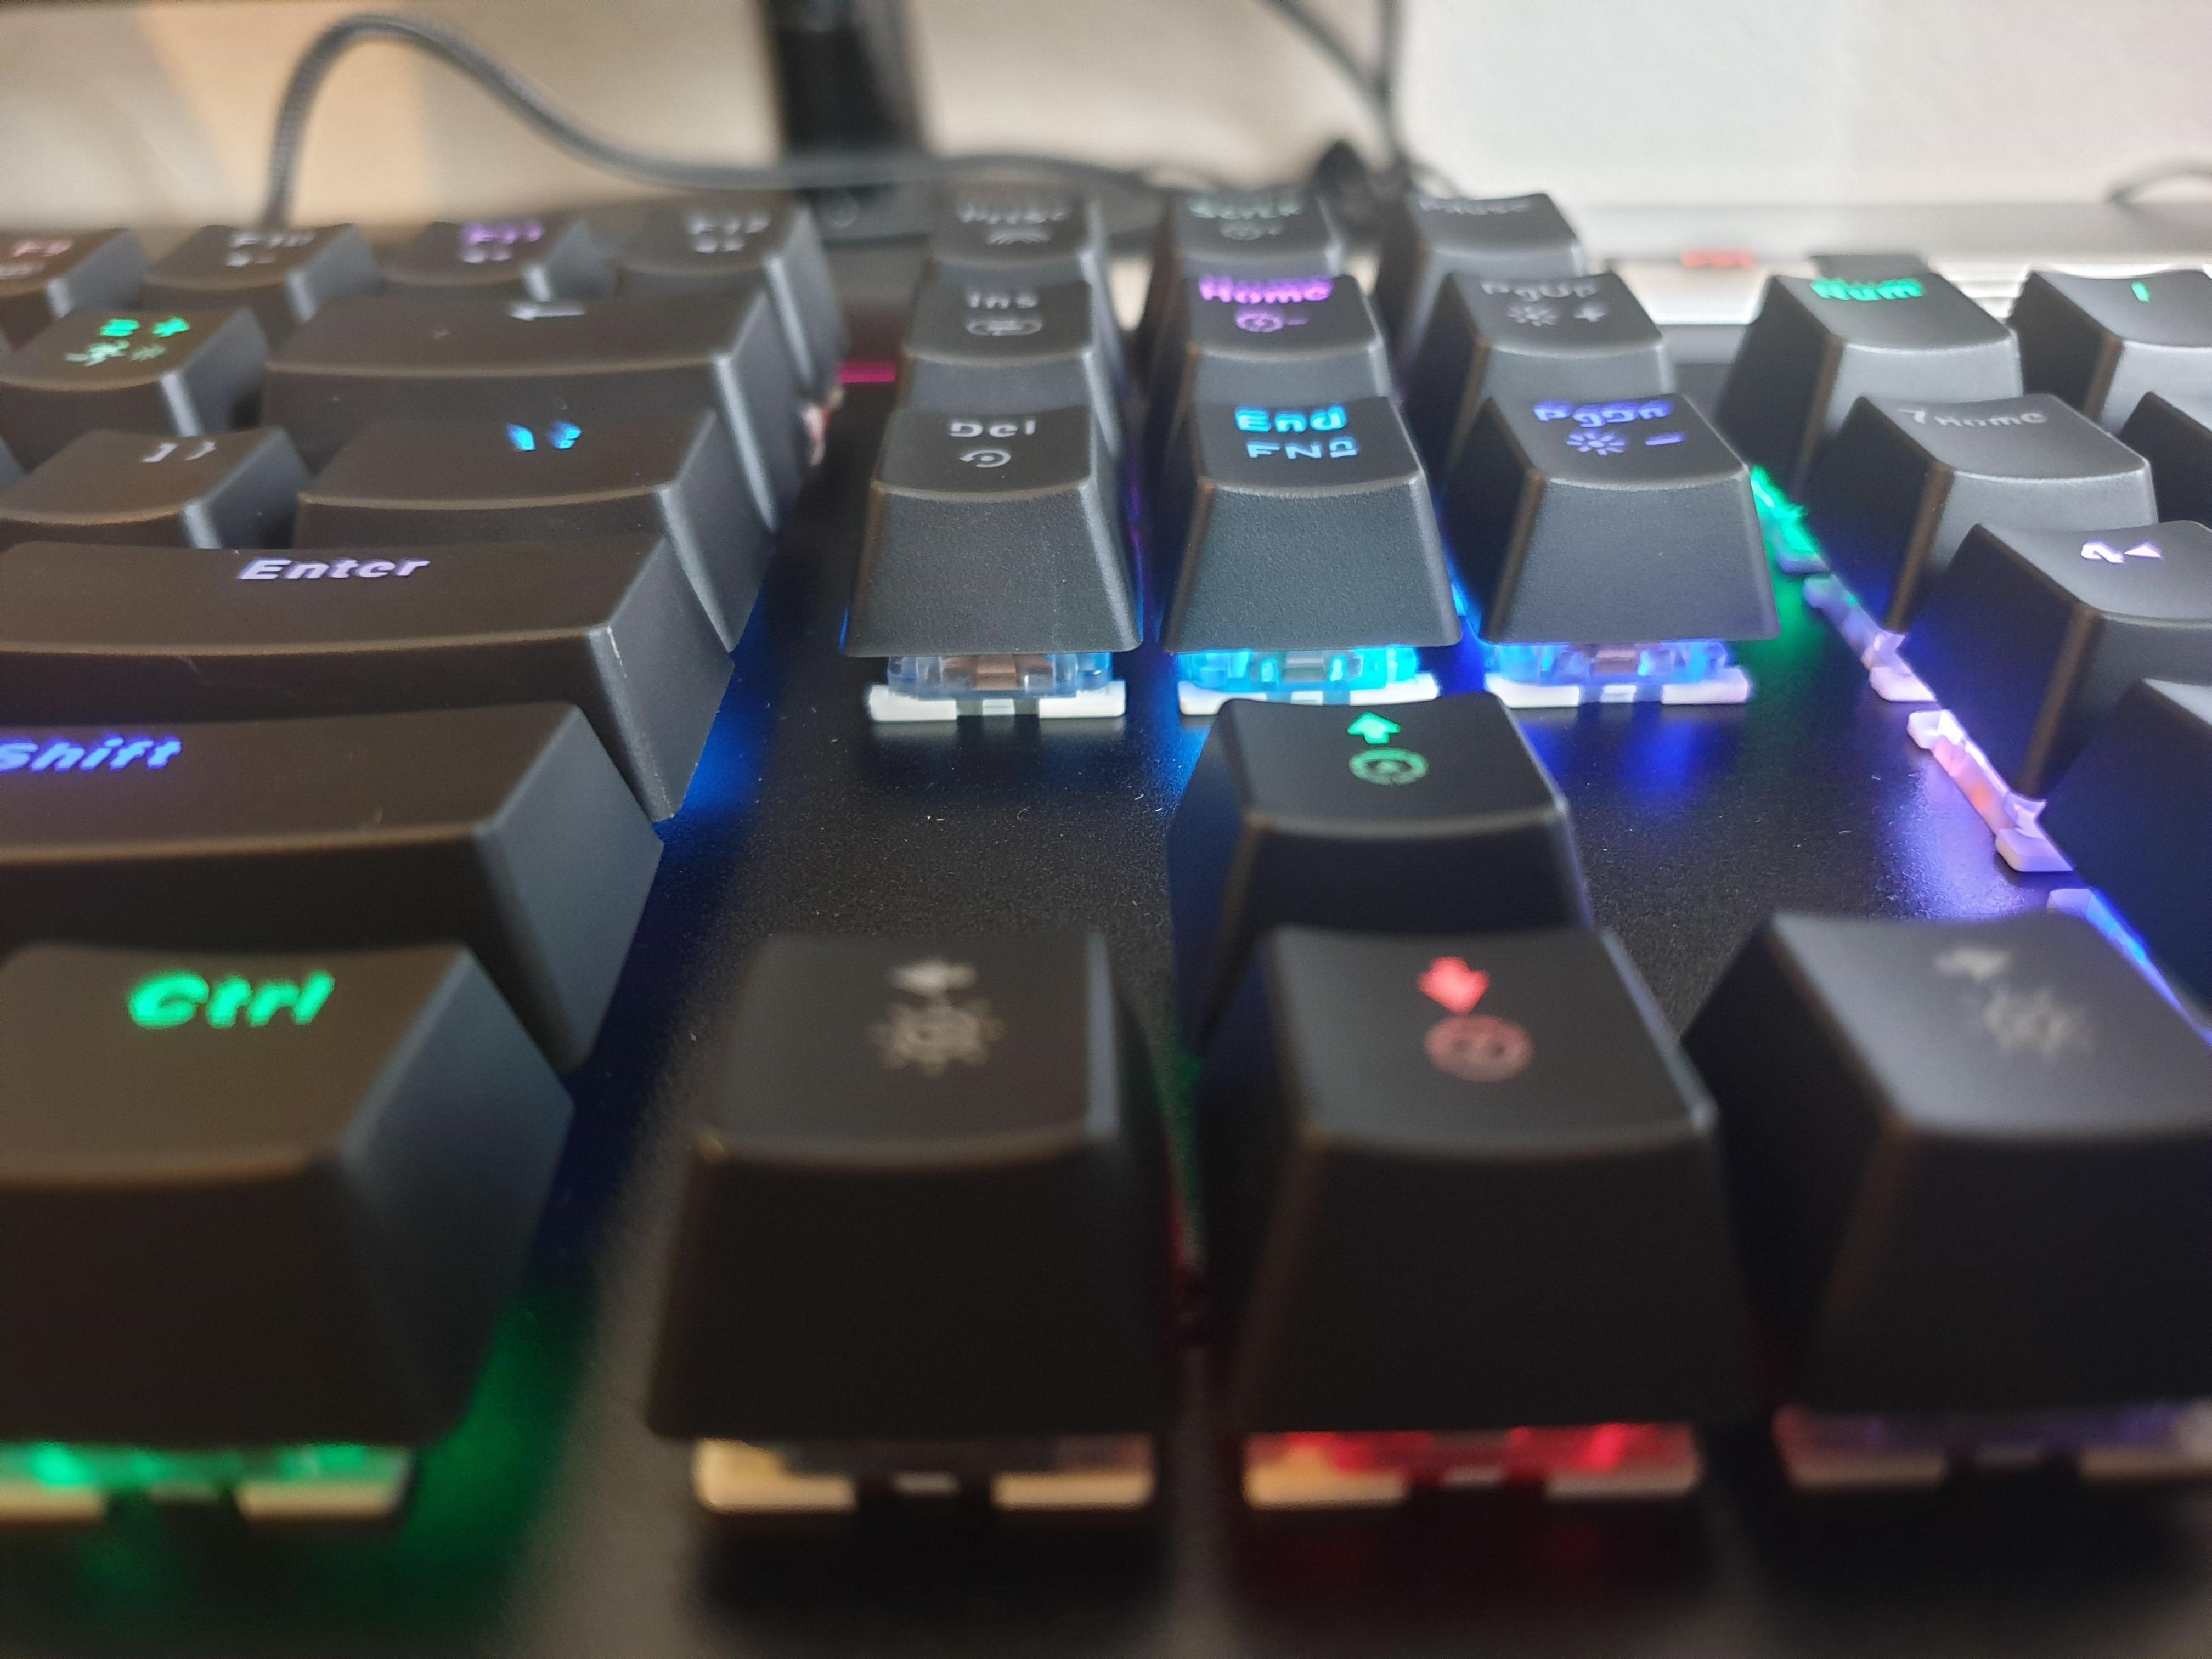 Image of my Havit mechanical keyboard